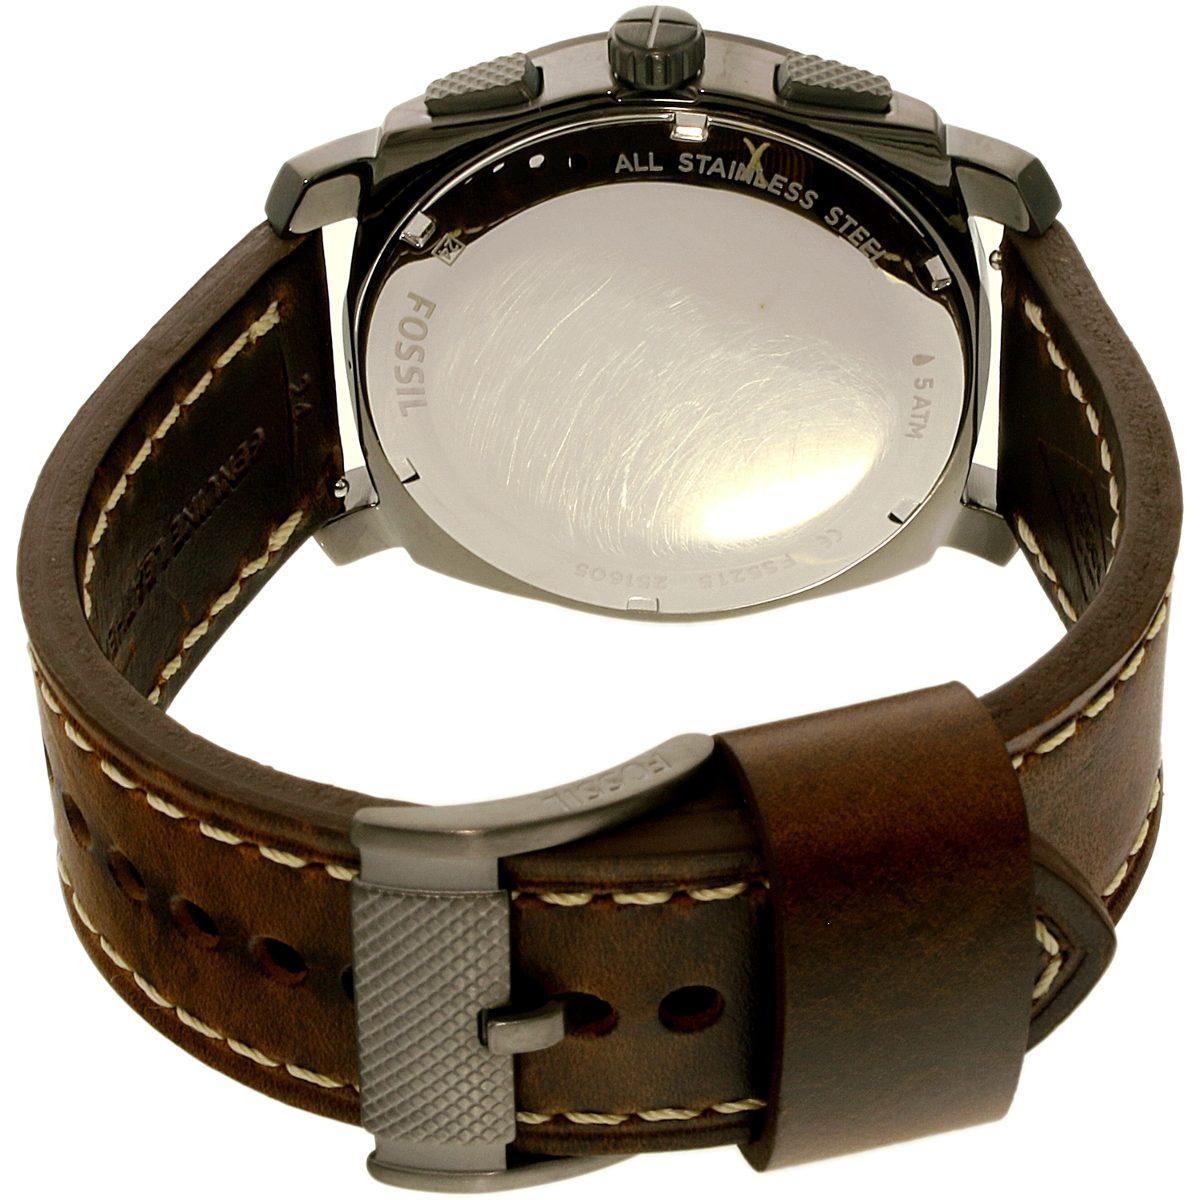 maquina-fosiles-cronografo-reloj-para-hombre-fs5215-D_NQ_NP_338615-MCO25286362782_012017-F